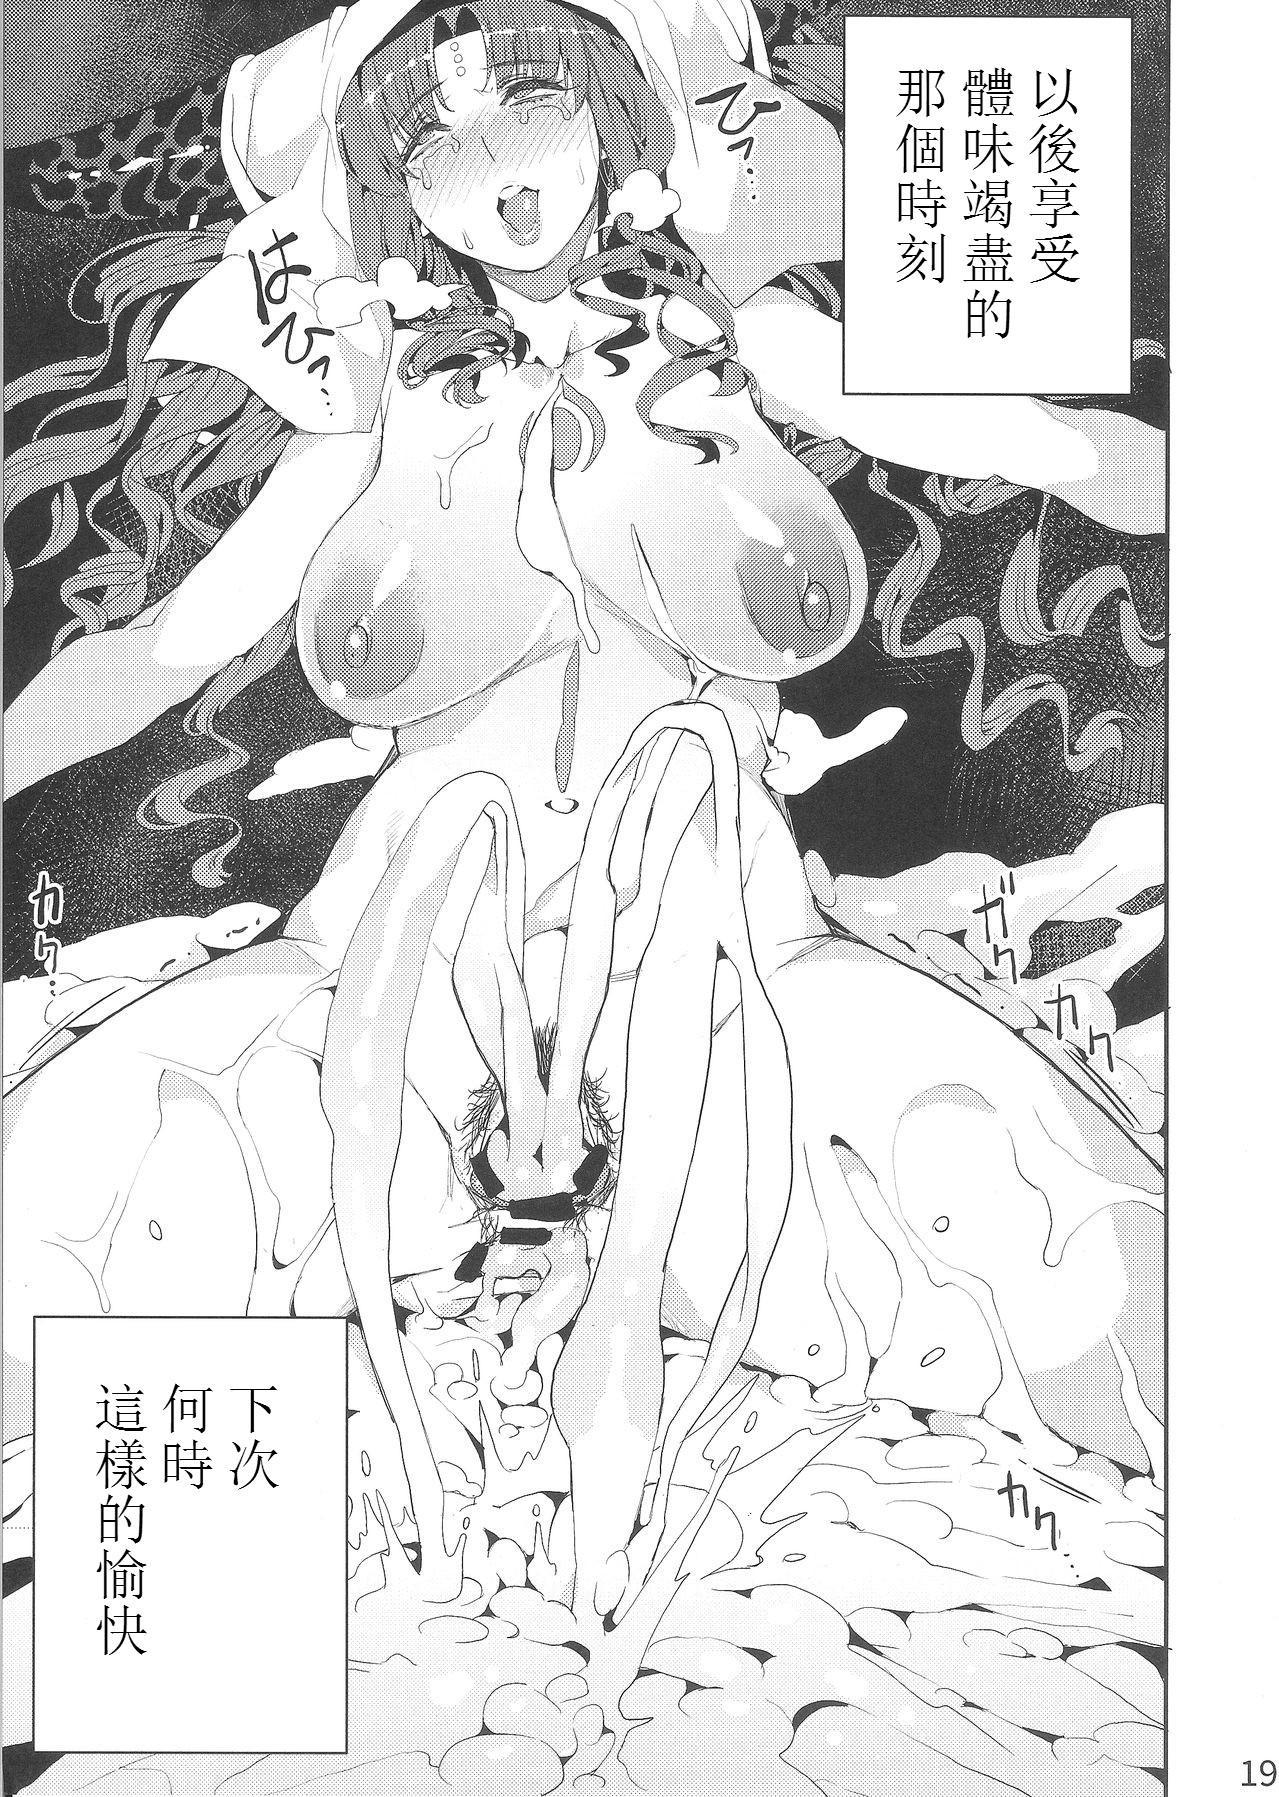 Mashou no Honnou 12